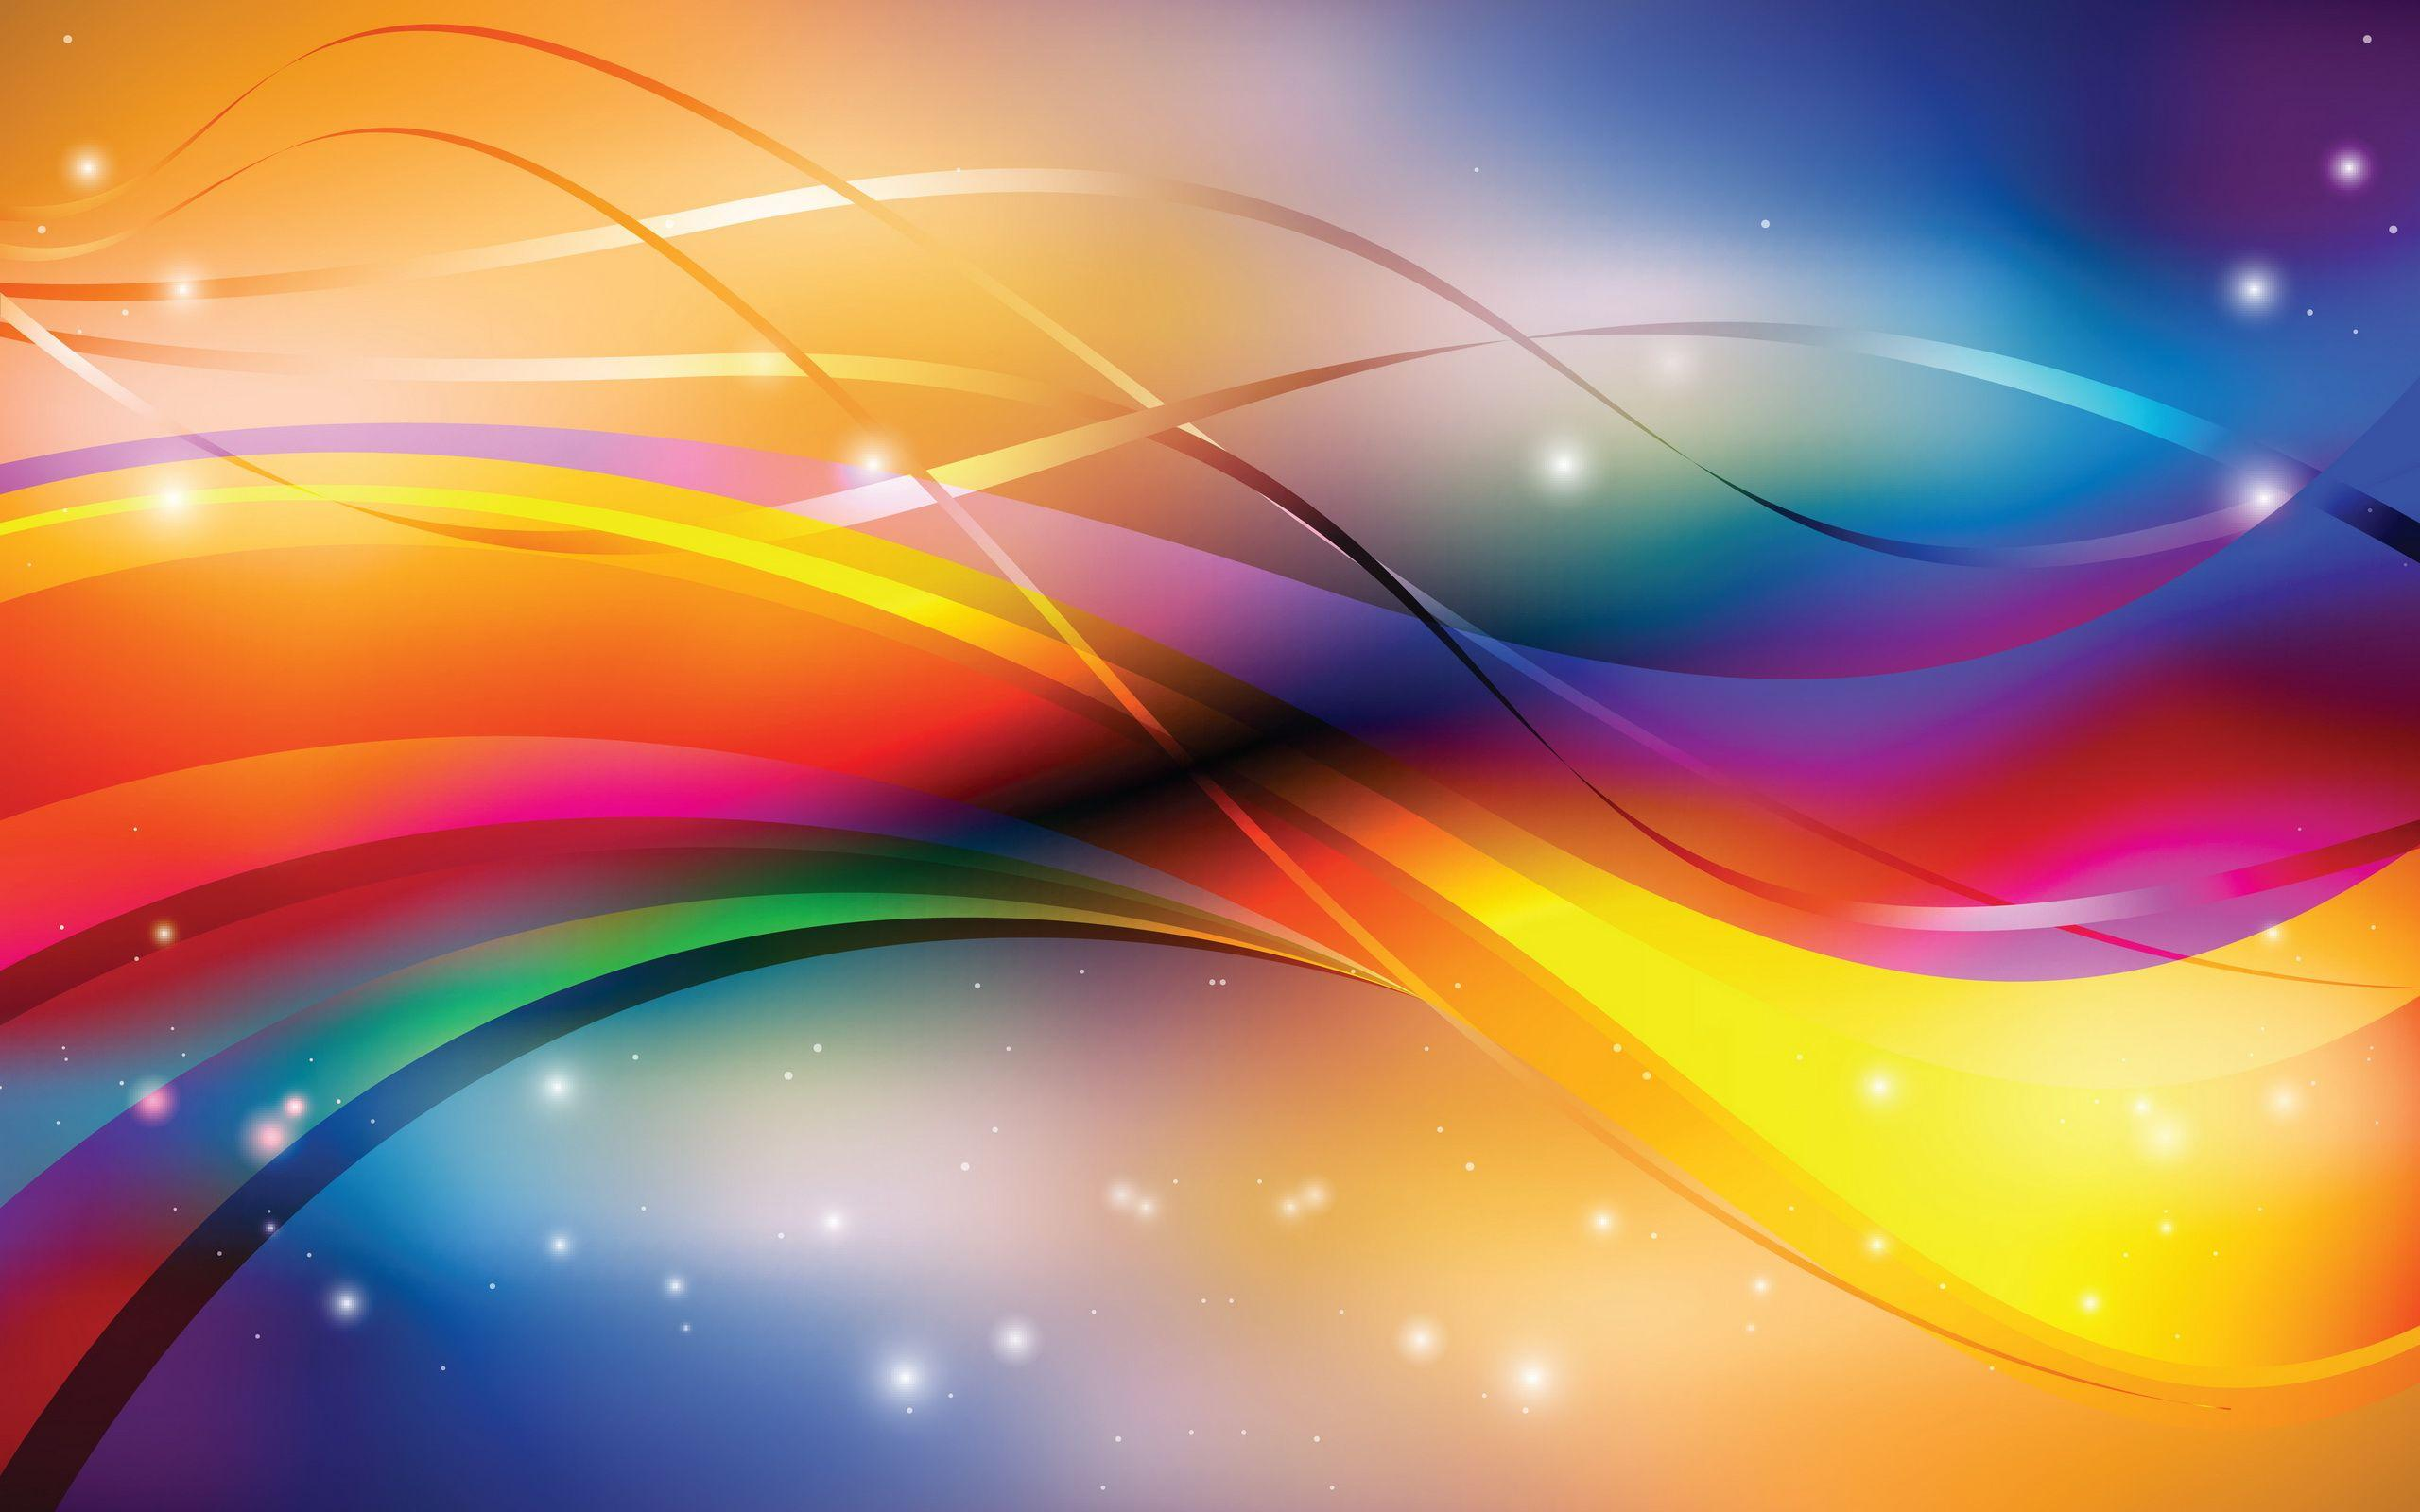 flex wallpapers top free flex backgrounds wallpaperaccess flex wallpapers top free flex